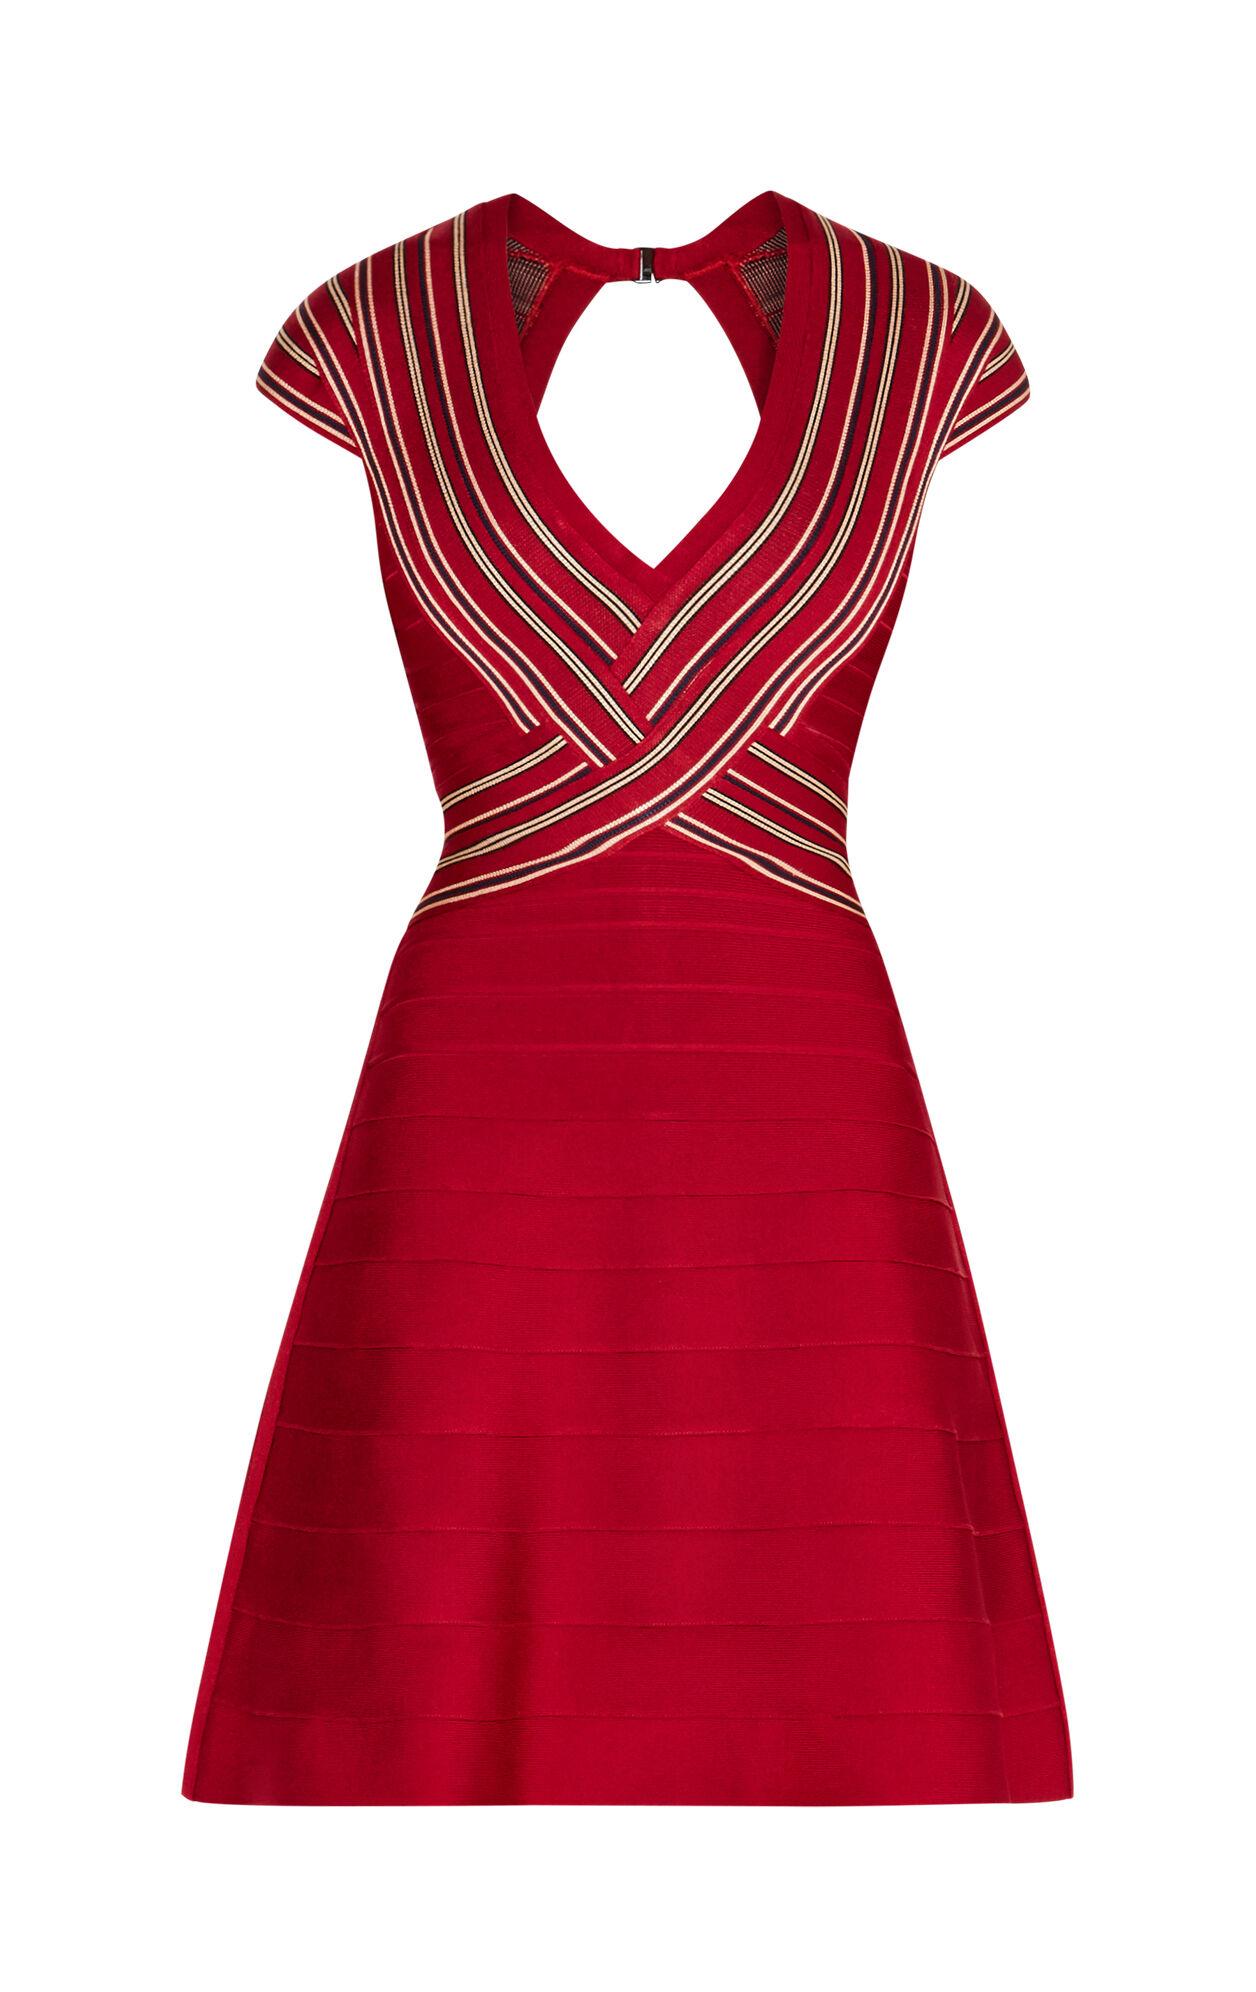 Chloe Engineered Eyelet Dress